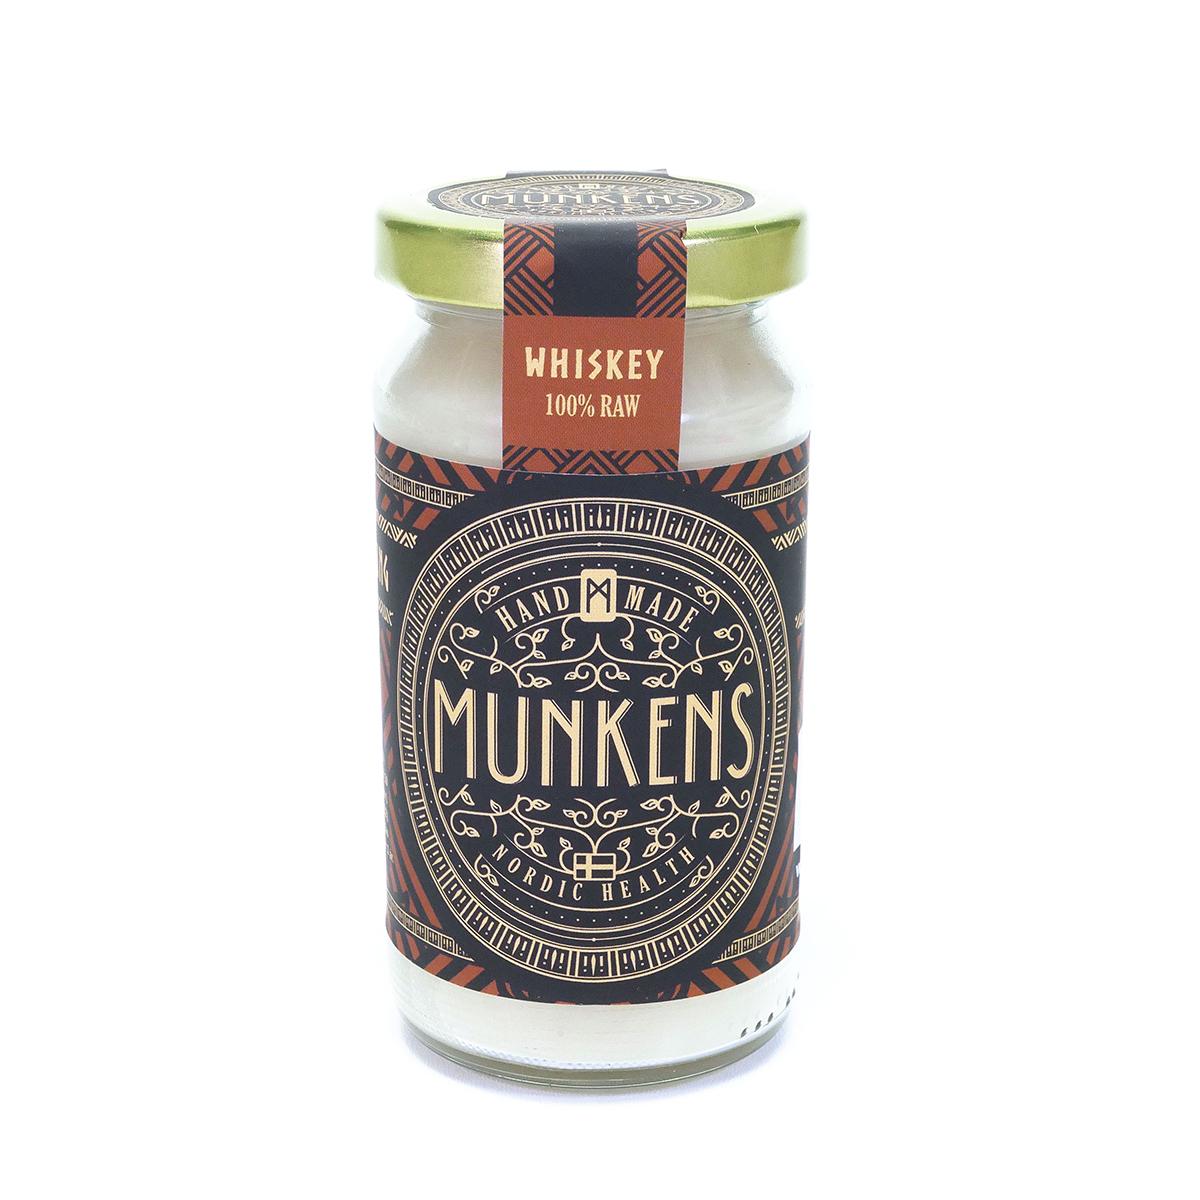 Munken_Svensk_Honung_Whiskey_280g